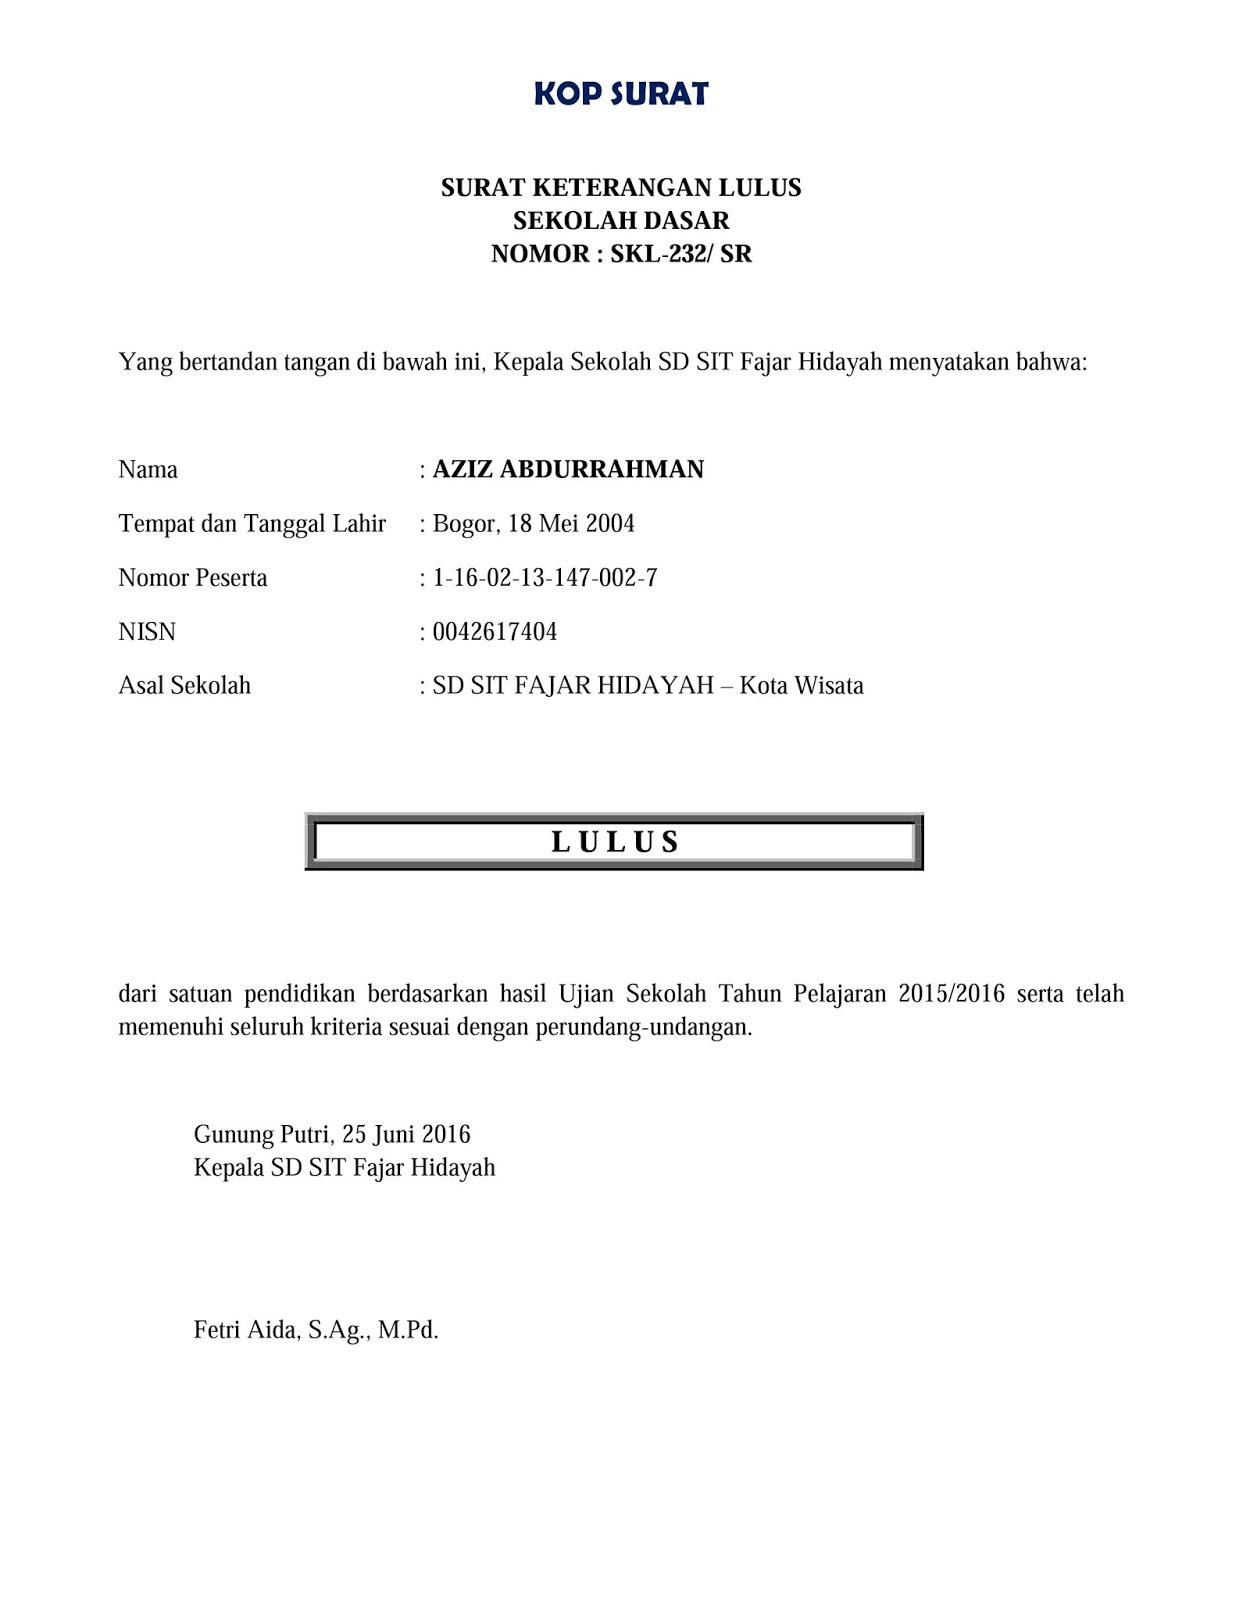 Contoh Surat Keterangan Lulus Sekolah Dasar Sd Folder Contoh Surat